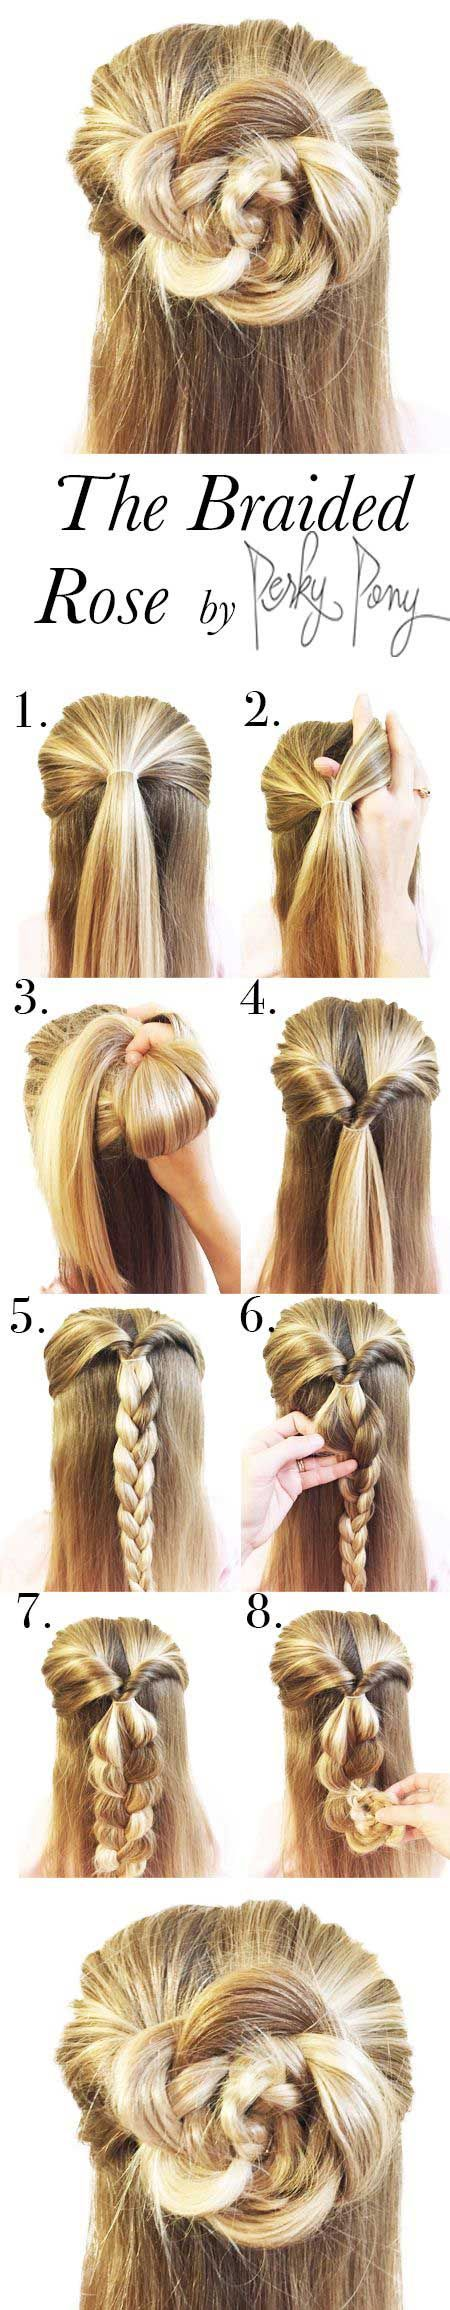 60 easy step by step hair tutorials for long mediumshort